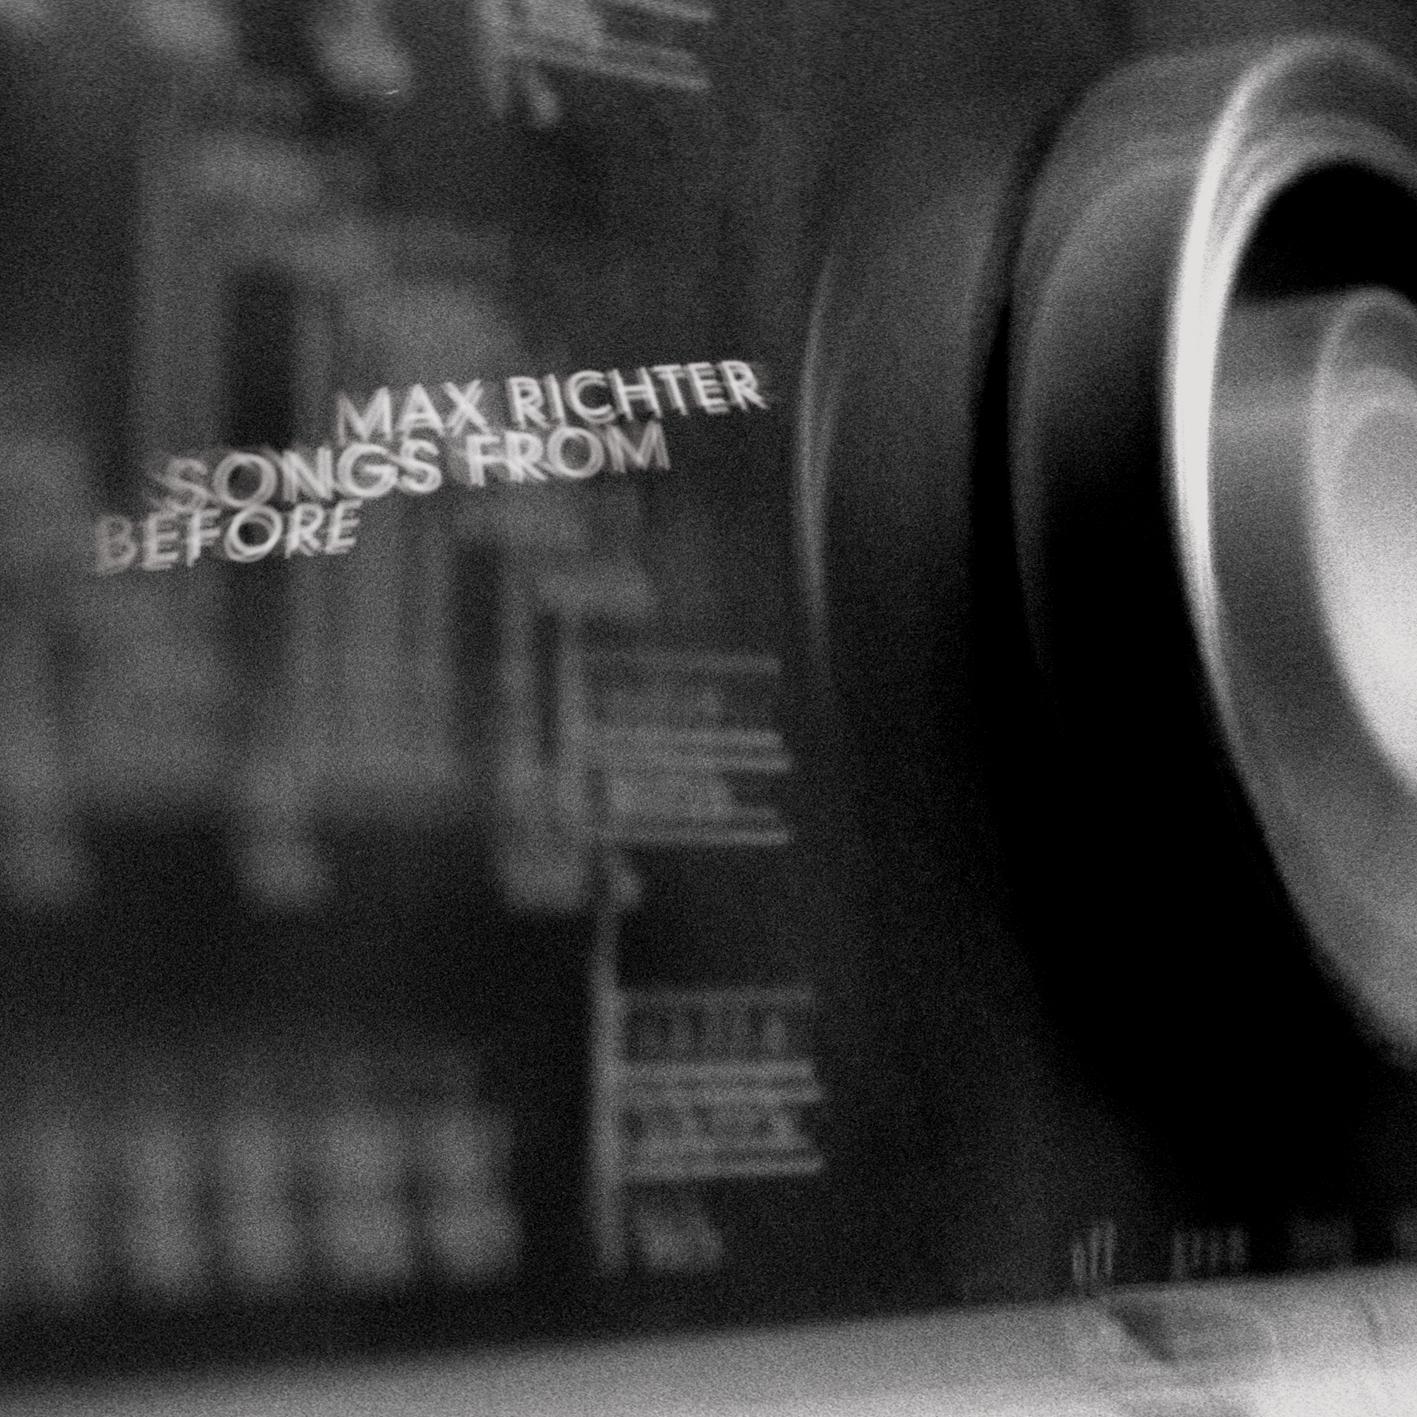 Max Richter – Songs From Before reissue (Deutsche Grammophon)